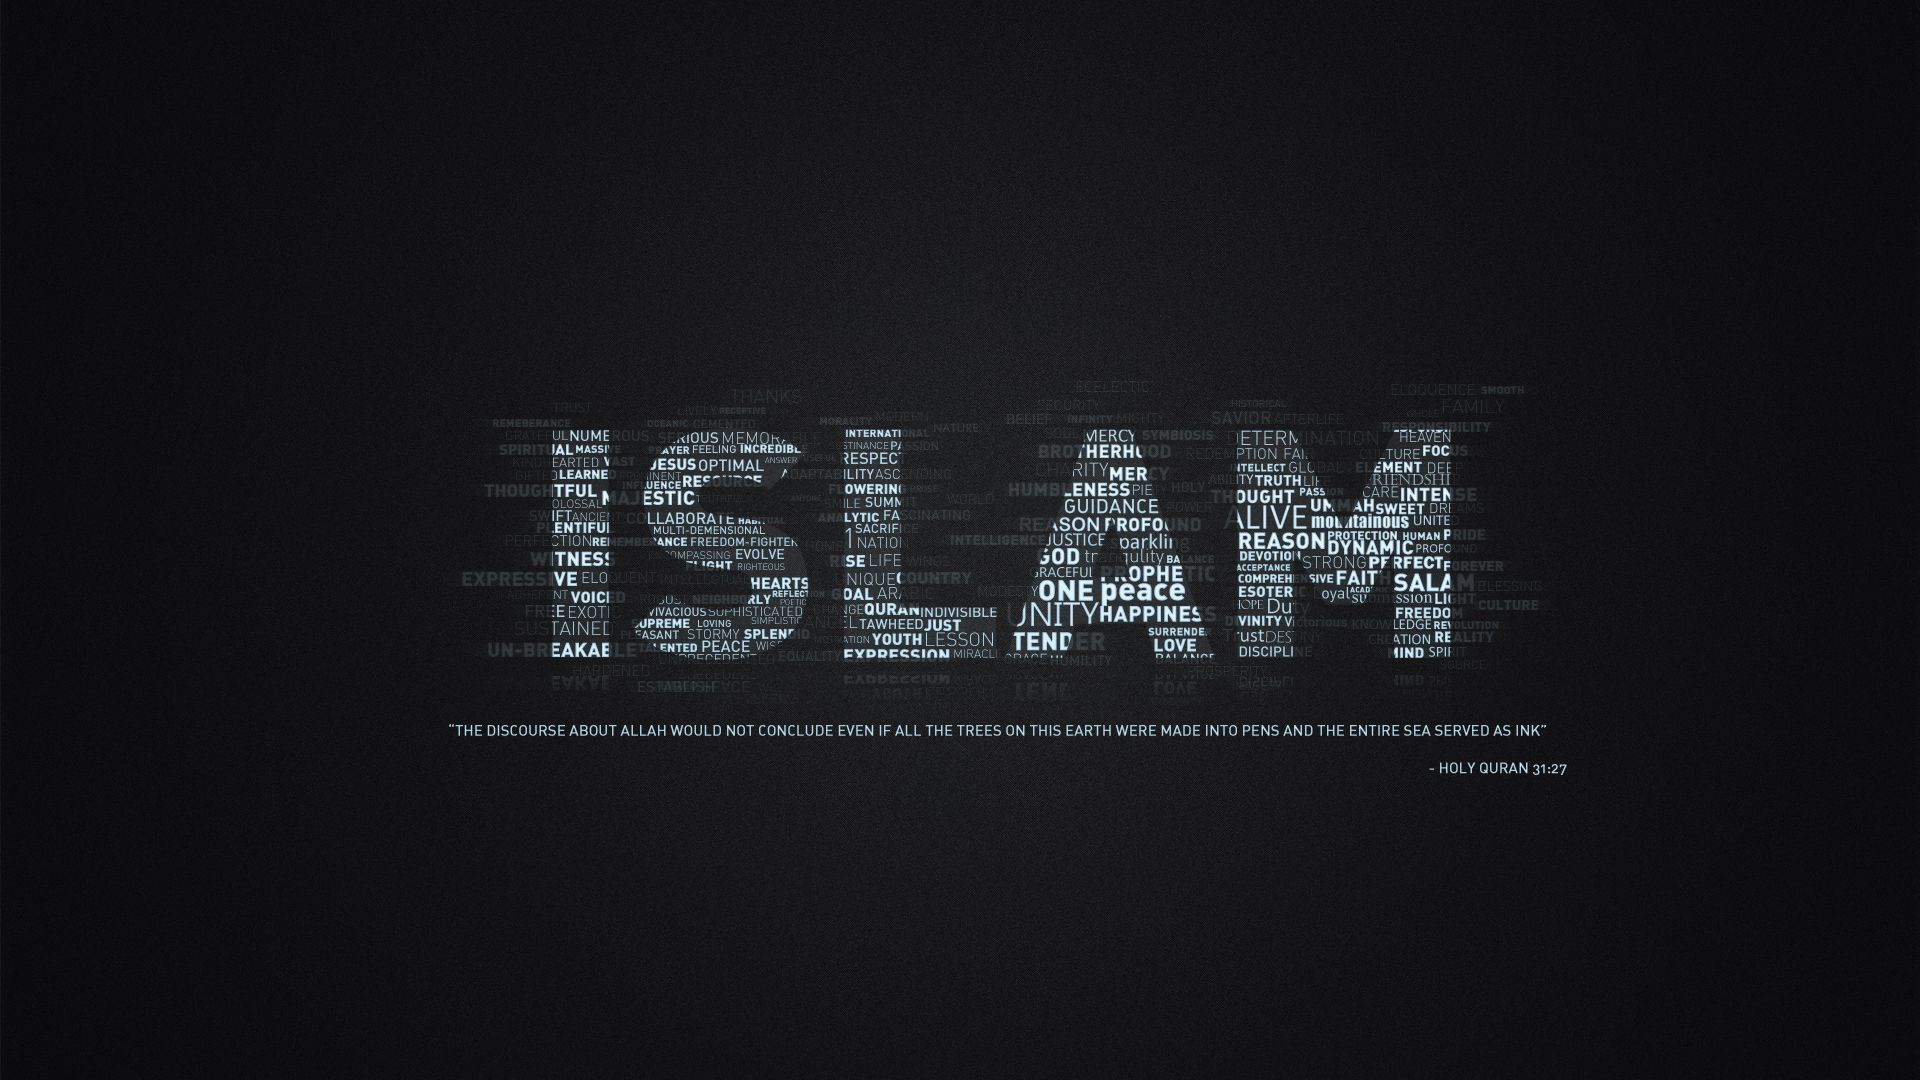 Islamic Wallpapers Quotes Download Free Hd Desktop Wallpapers In Wallpaper Islami Wallpaper Gelap Motivasi